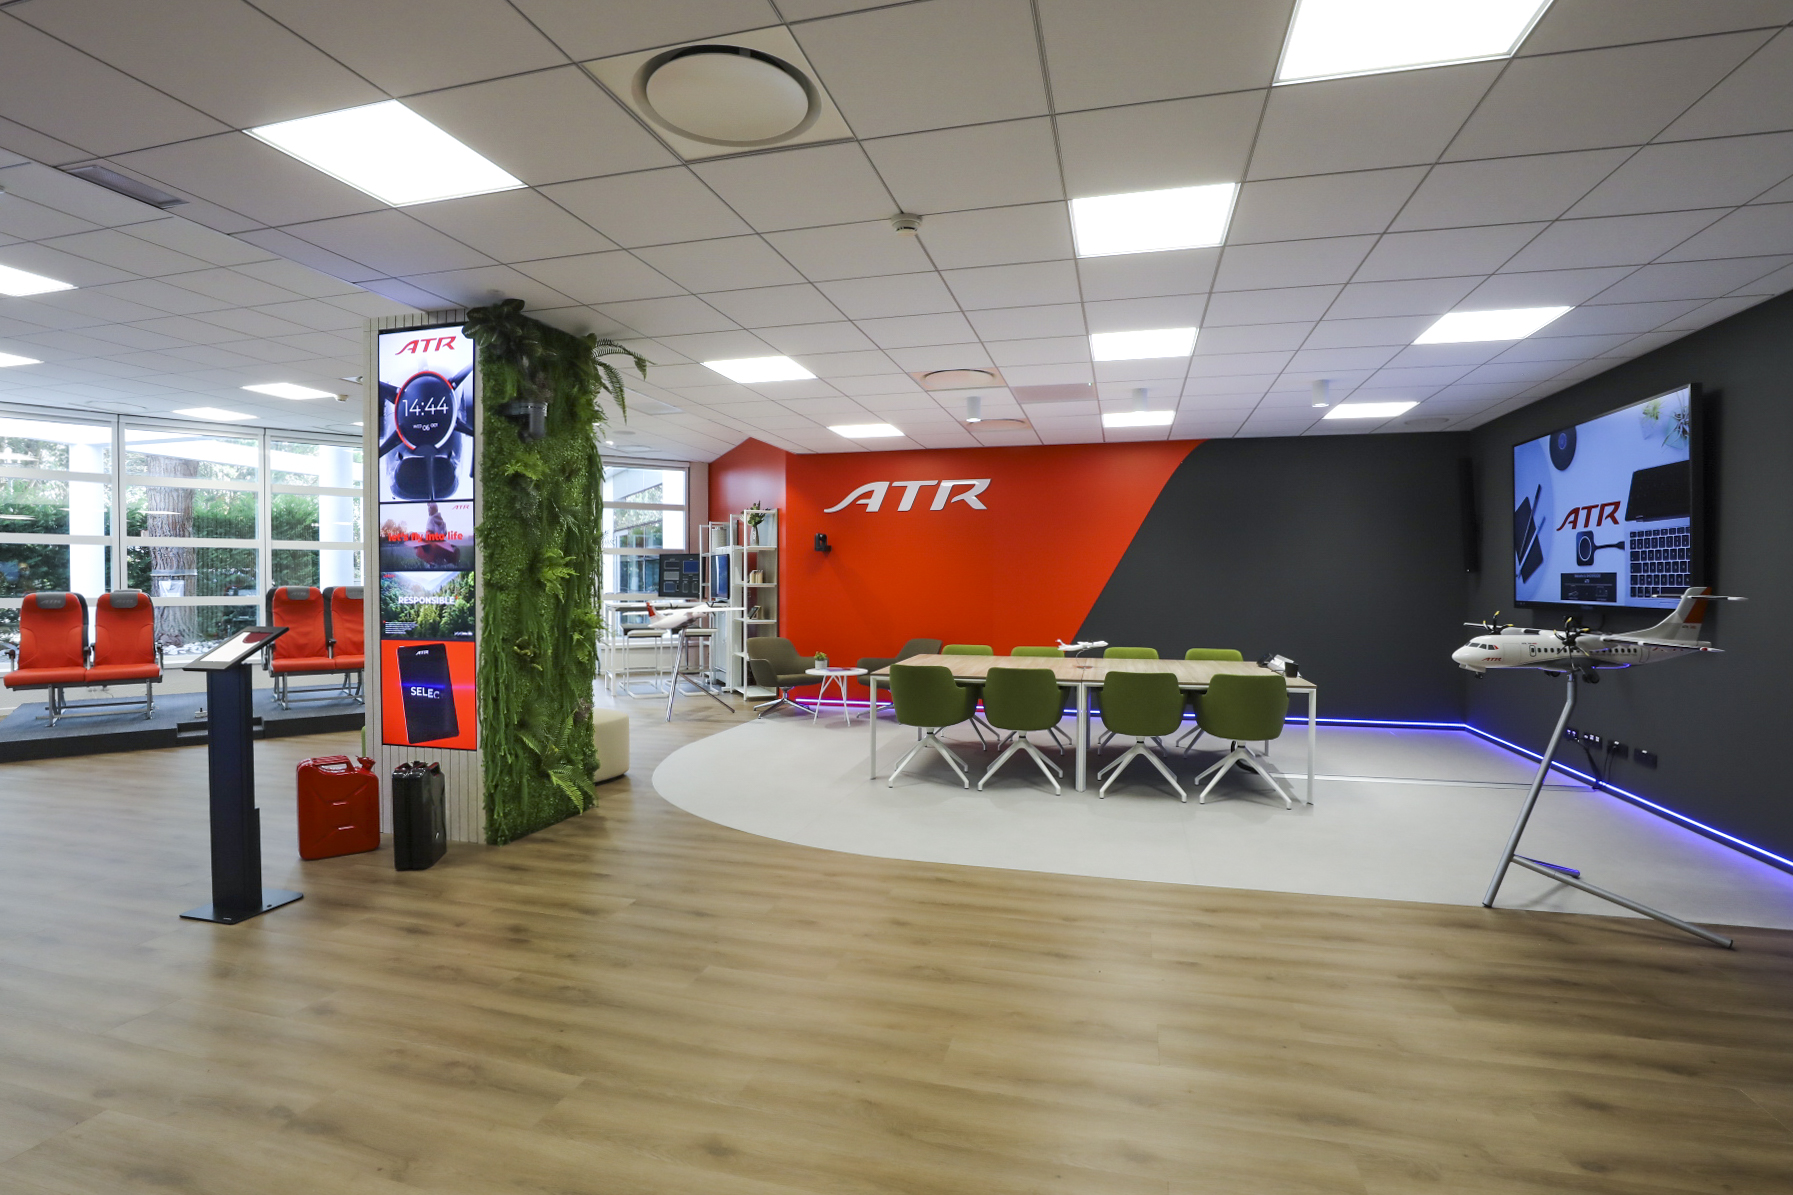 ATR inaugurates cutting-edge Customer Experience Studio